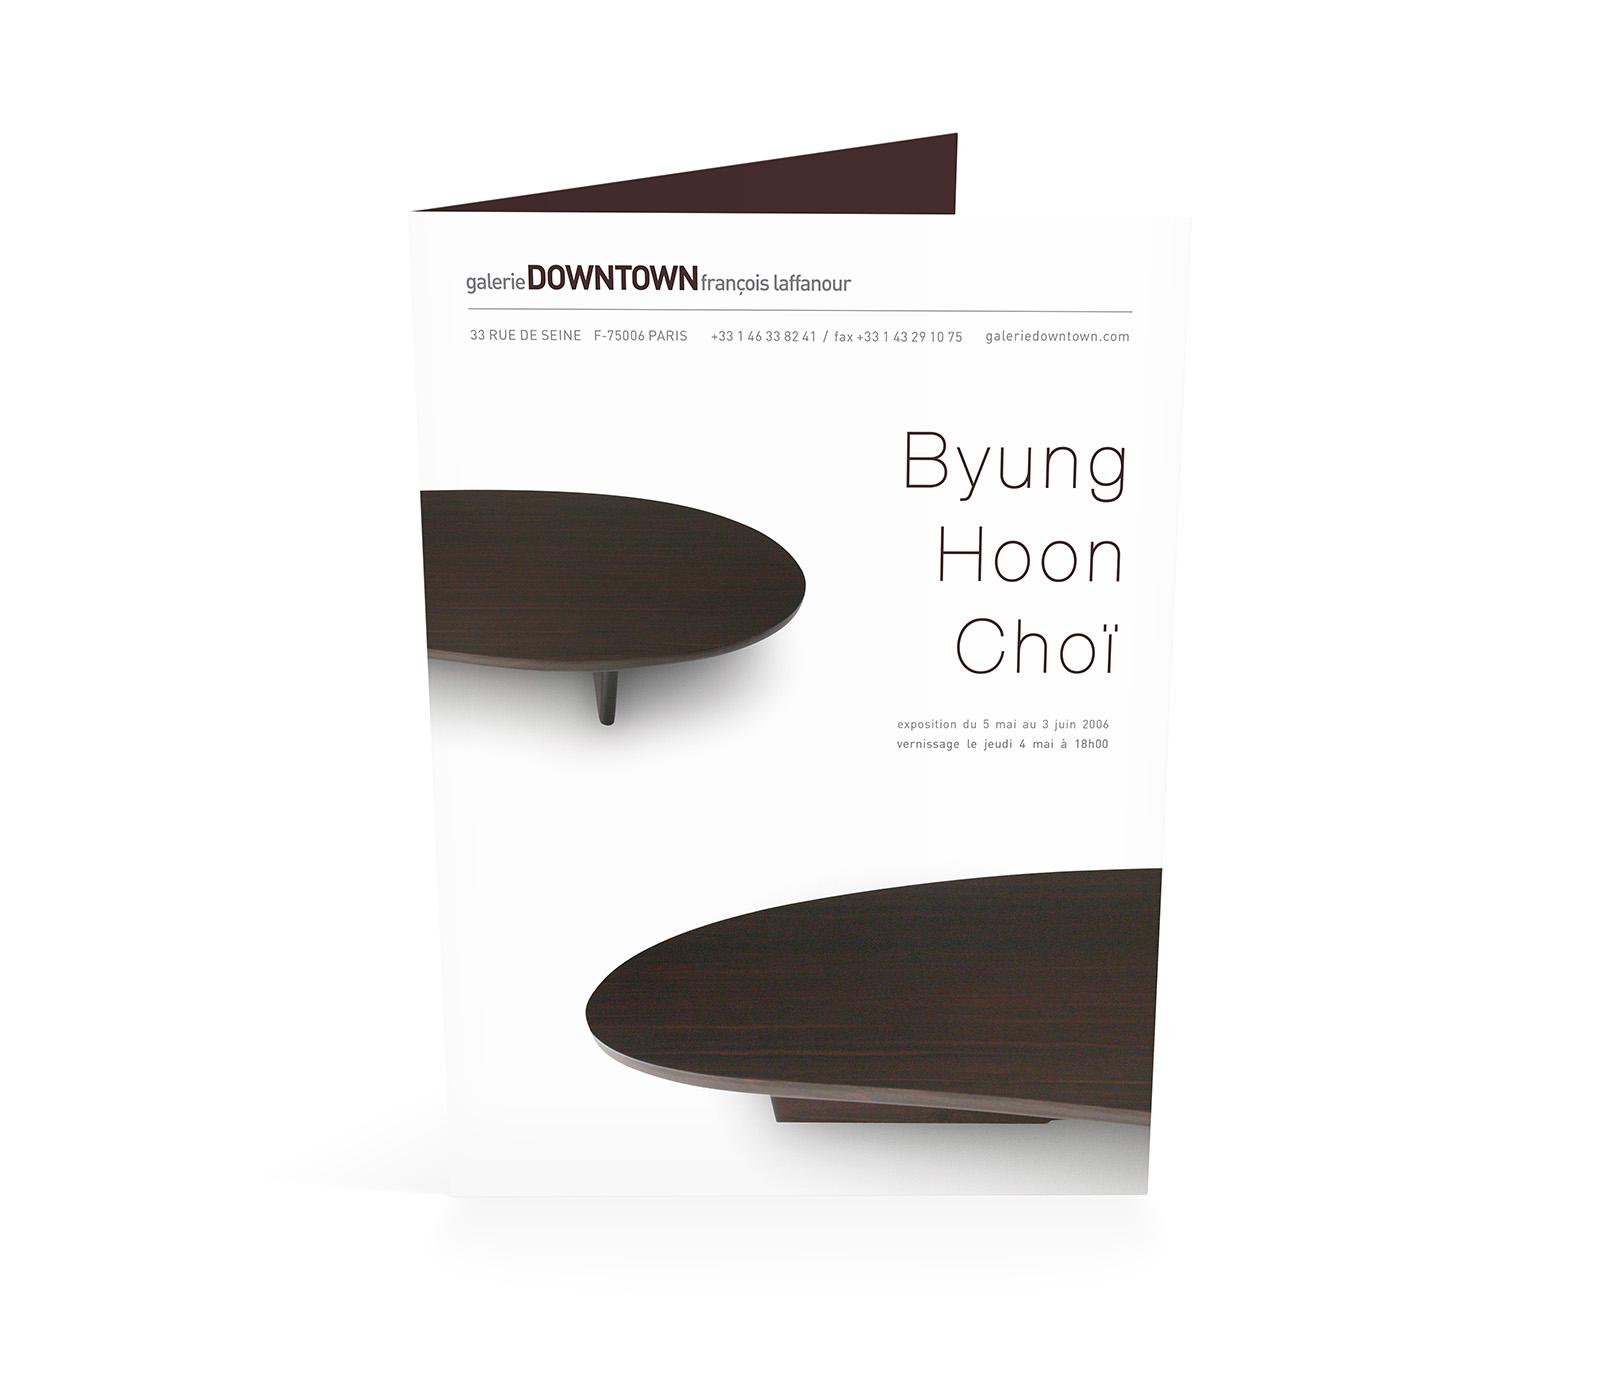 galerieDOWNTOWN - Carton invitation Byung Hoon Choi 2006 F